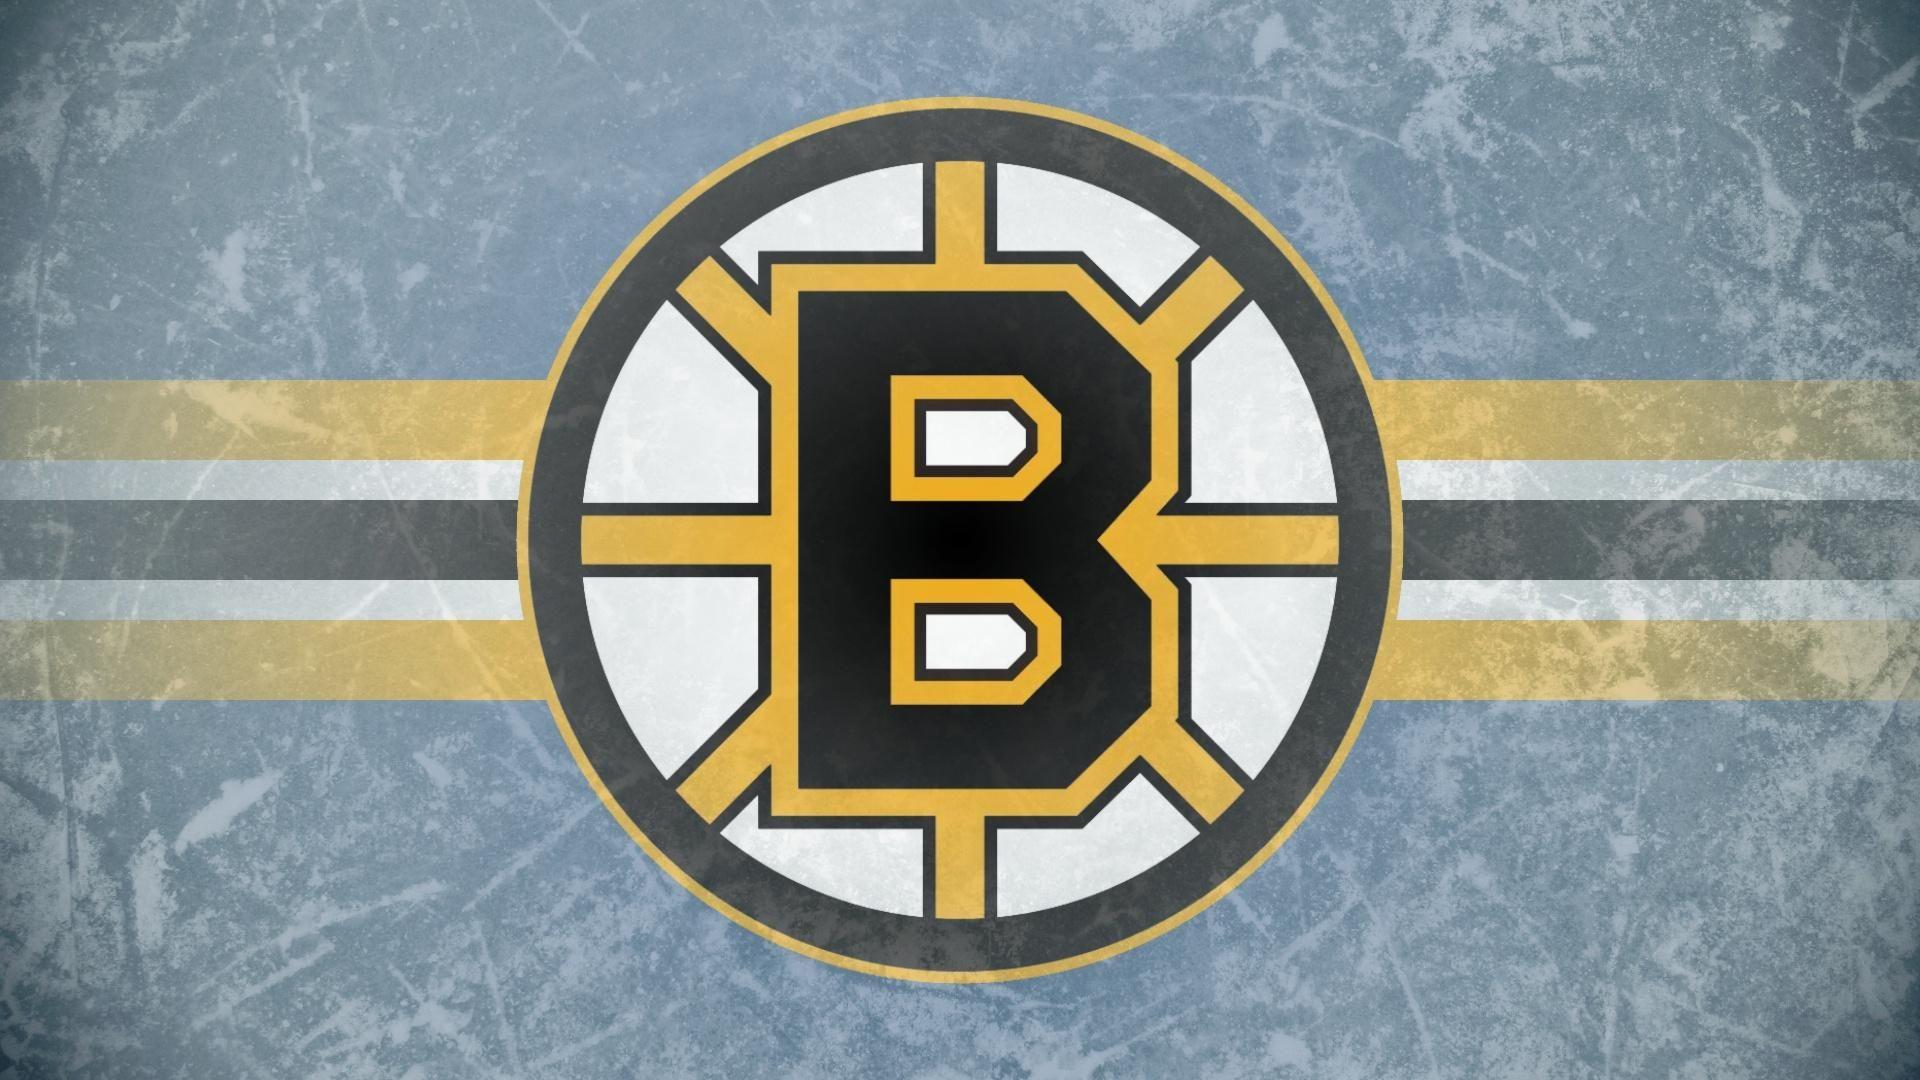 Bruins Phone Wallpaper 1920 1080 Bruins Pictures Wallpapers 41 Wallpapers Adorable Wallpapers Boston Bruins Logo Nhl Boston Bruins Boston Bruins